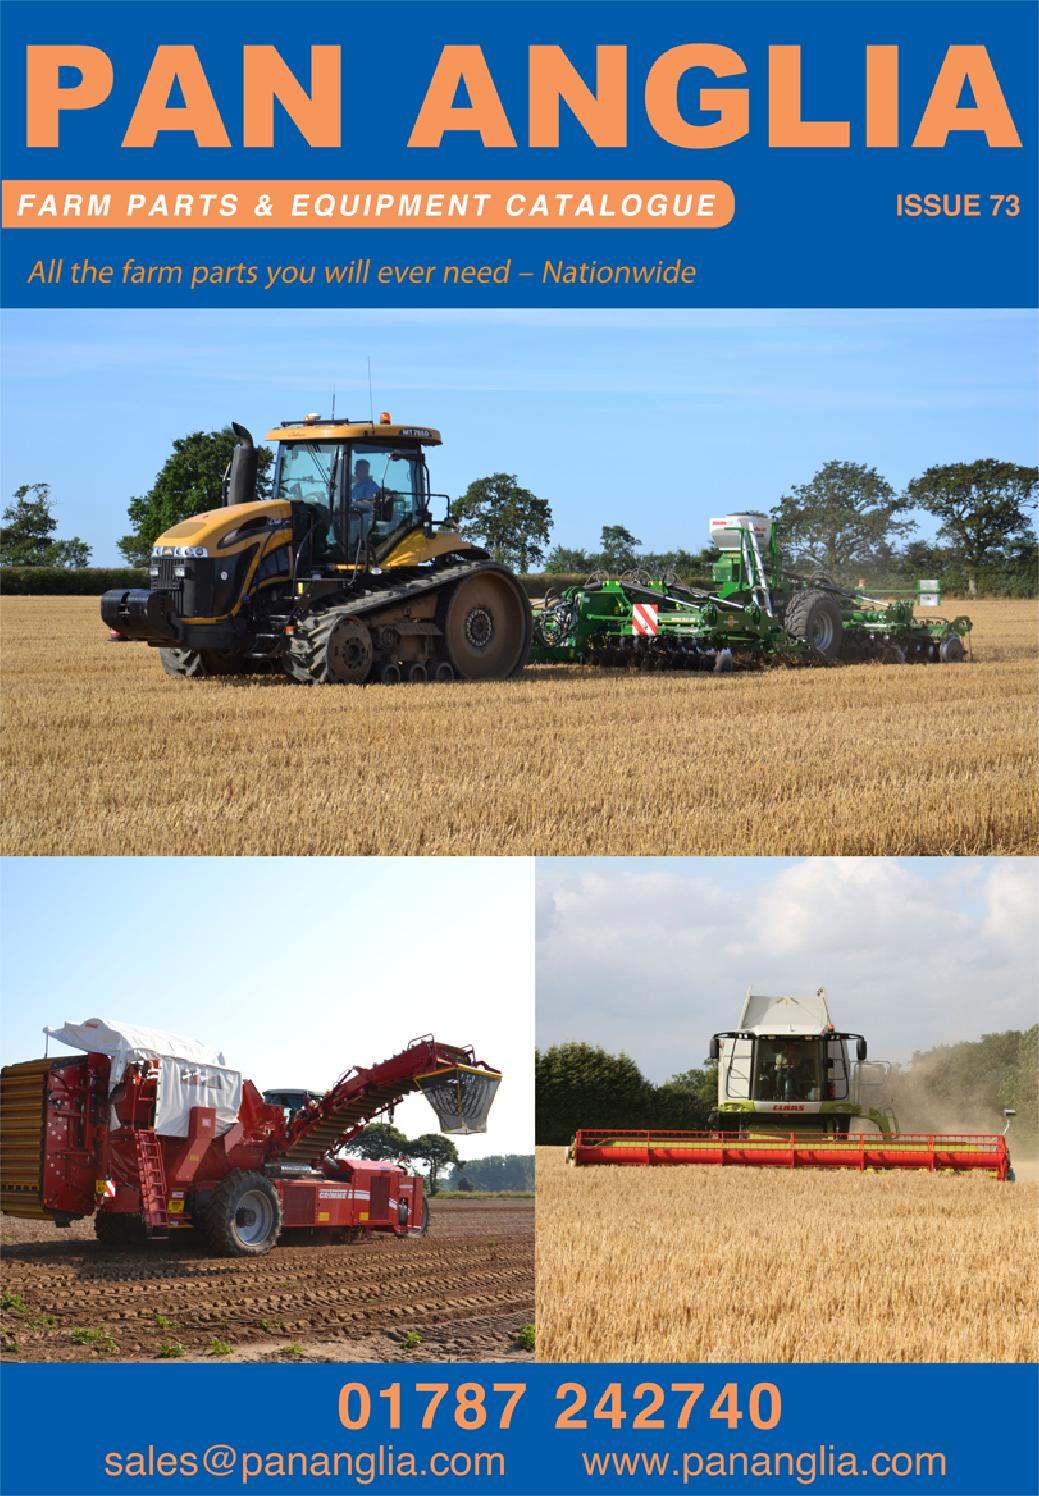 Pan Anglia Catalogue By Relbon Limited